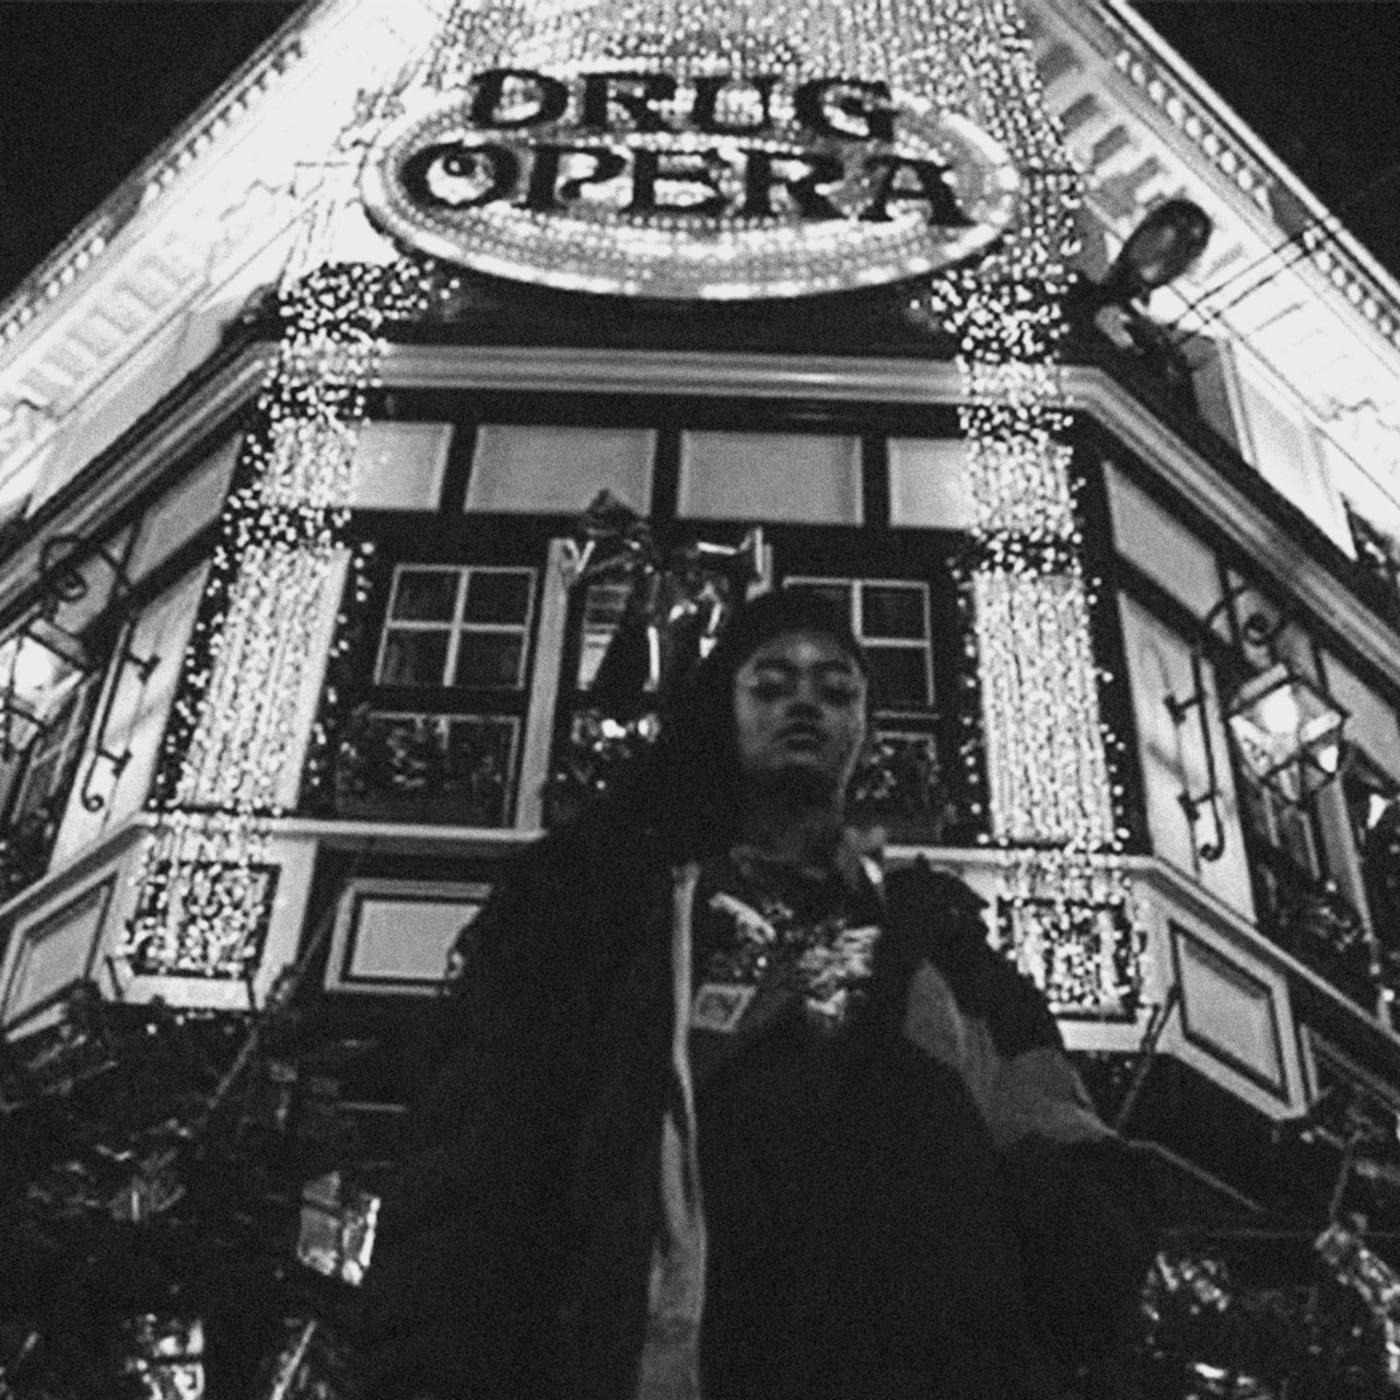 image of Chynna drug operaalbum